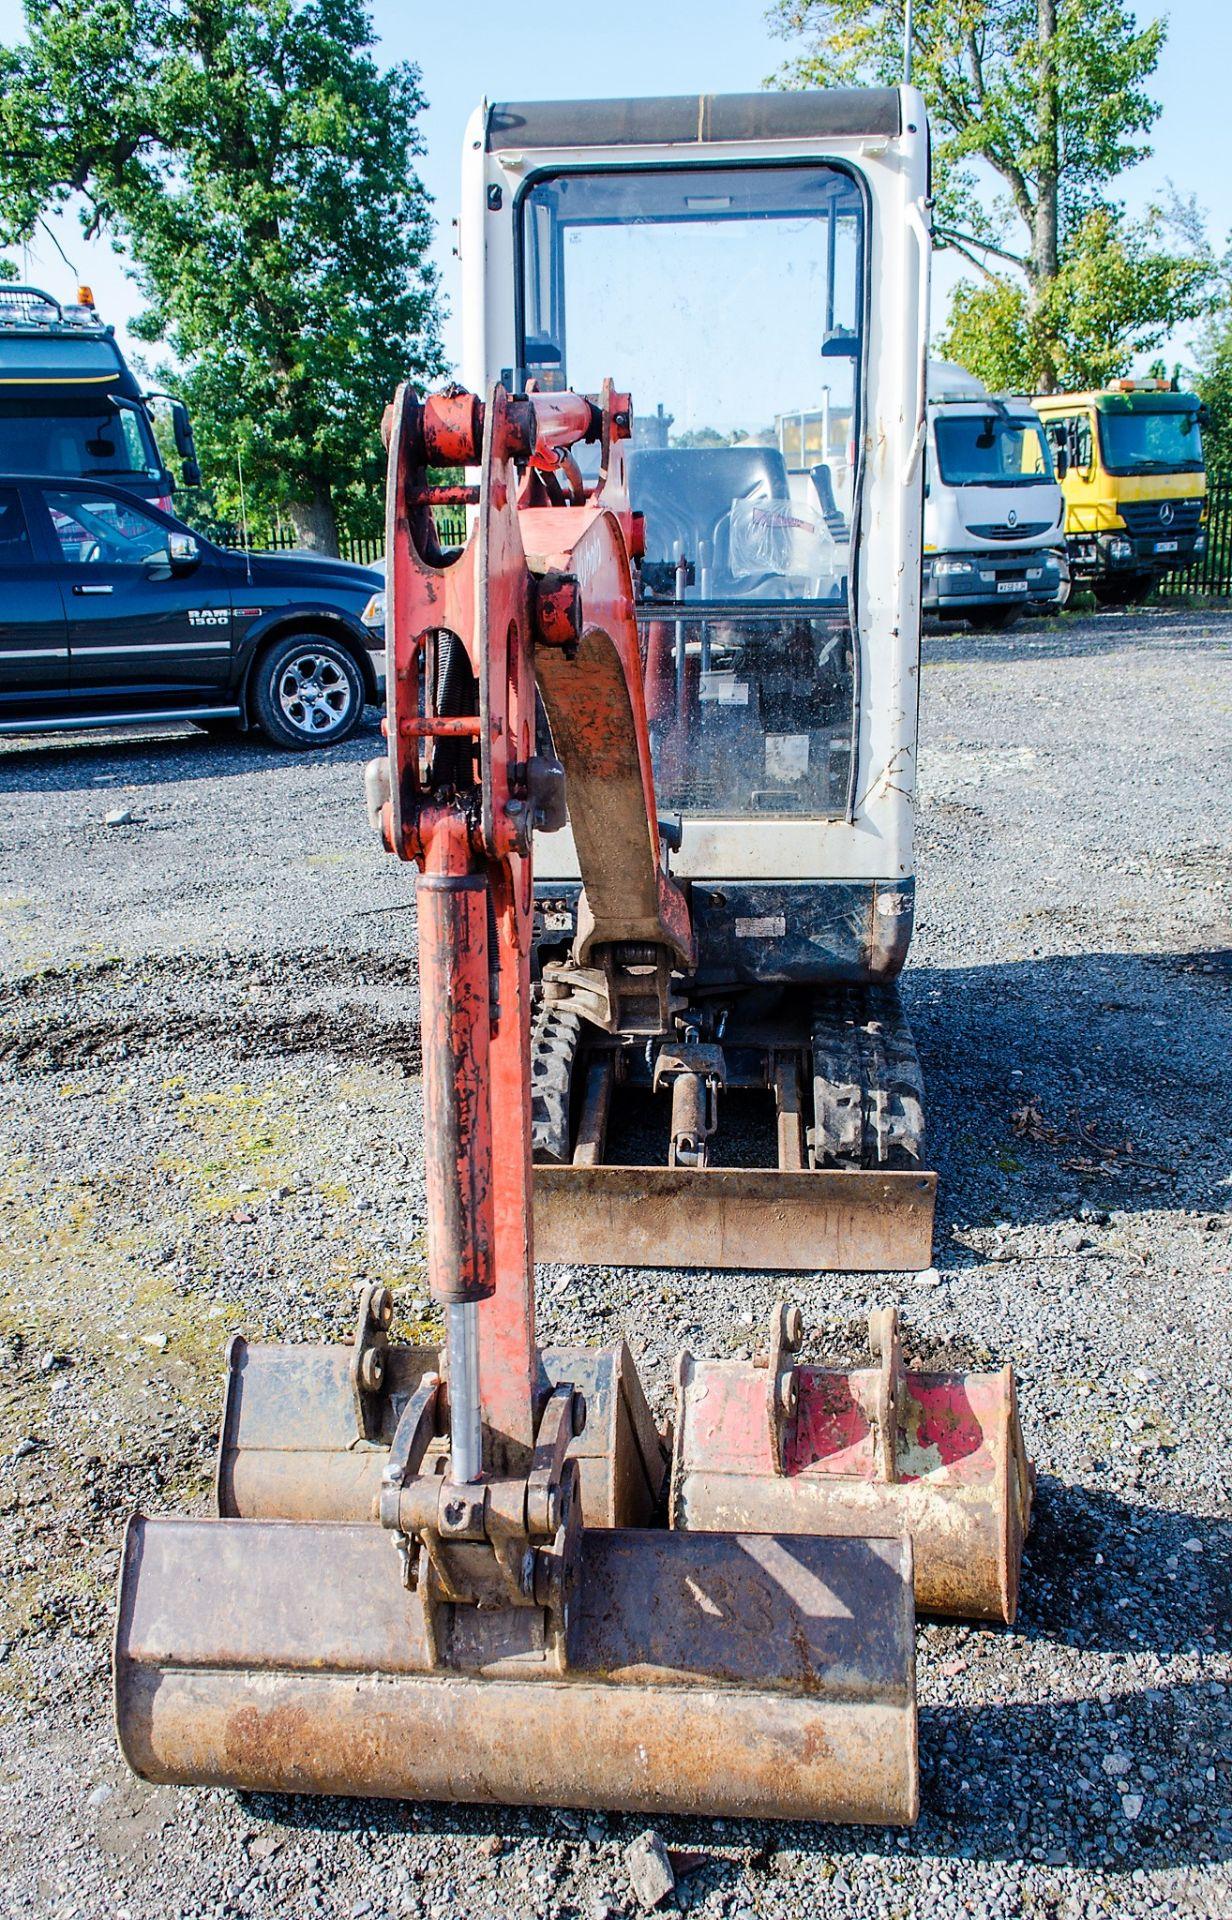 Kubota KX36-3 1.5 tonne rubber tracked mini excavator Year: 2007 S/N: Z077298 Recorded Hours: 4205 - Image 5 of 18